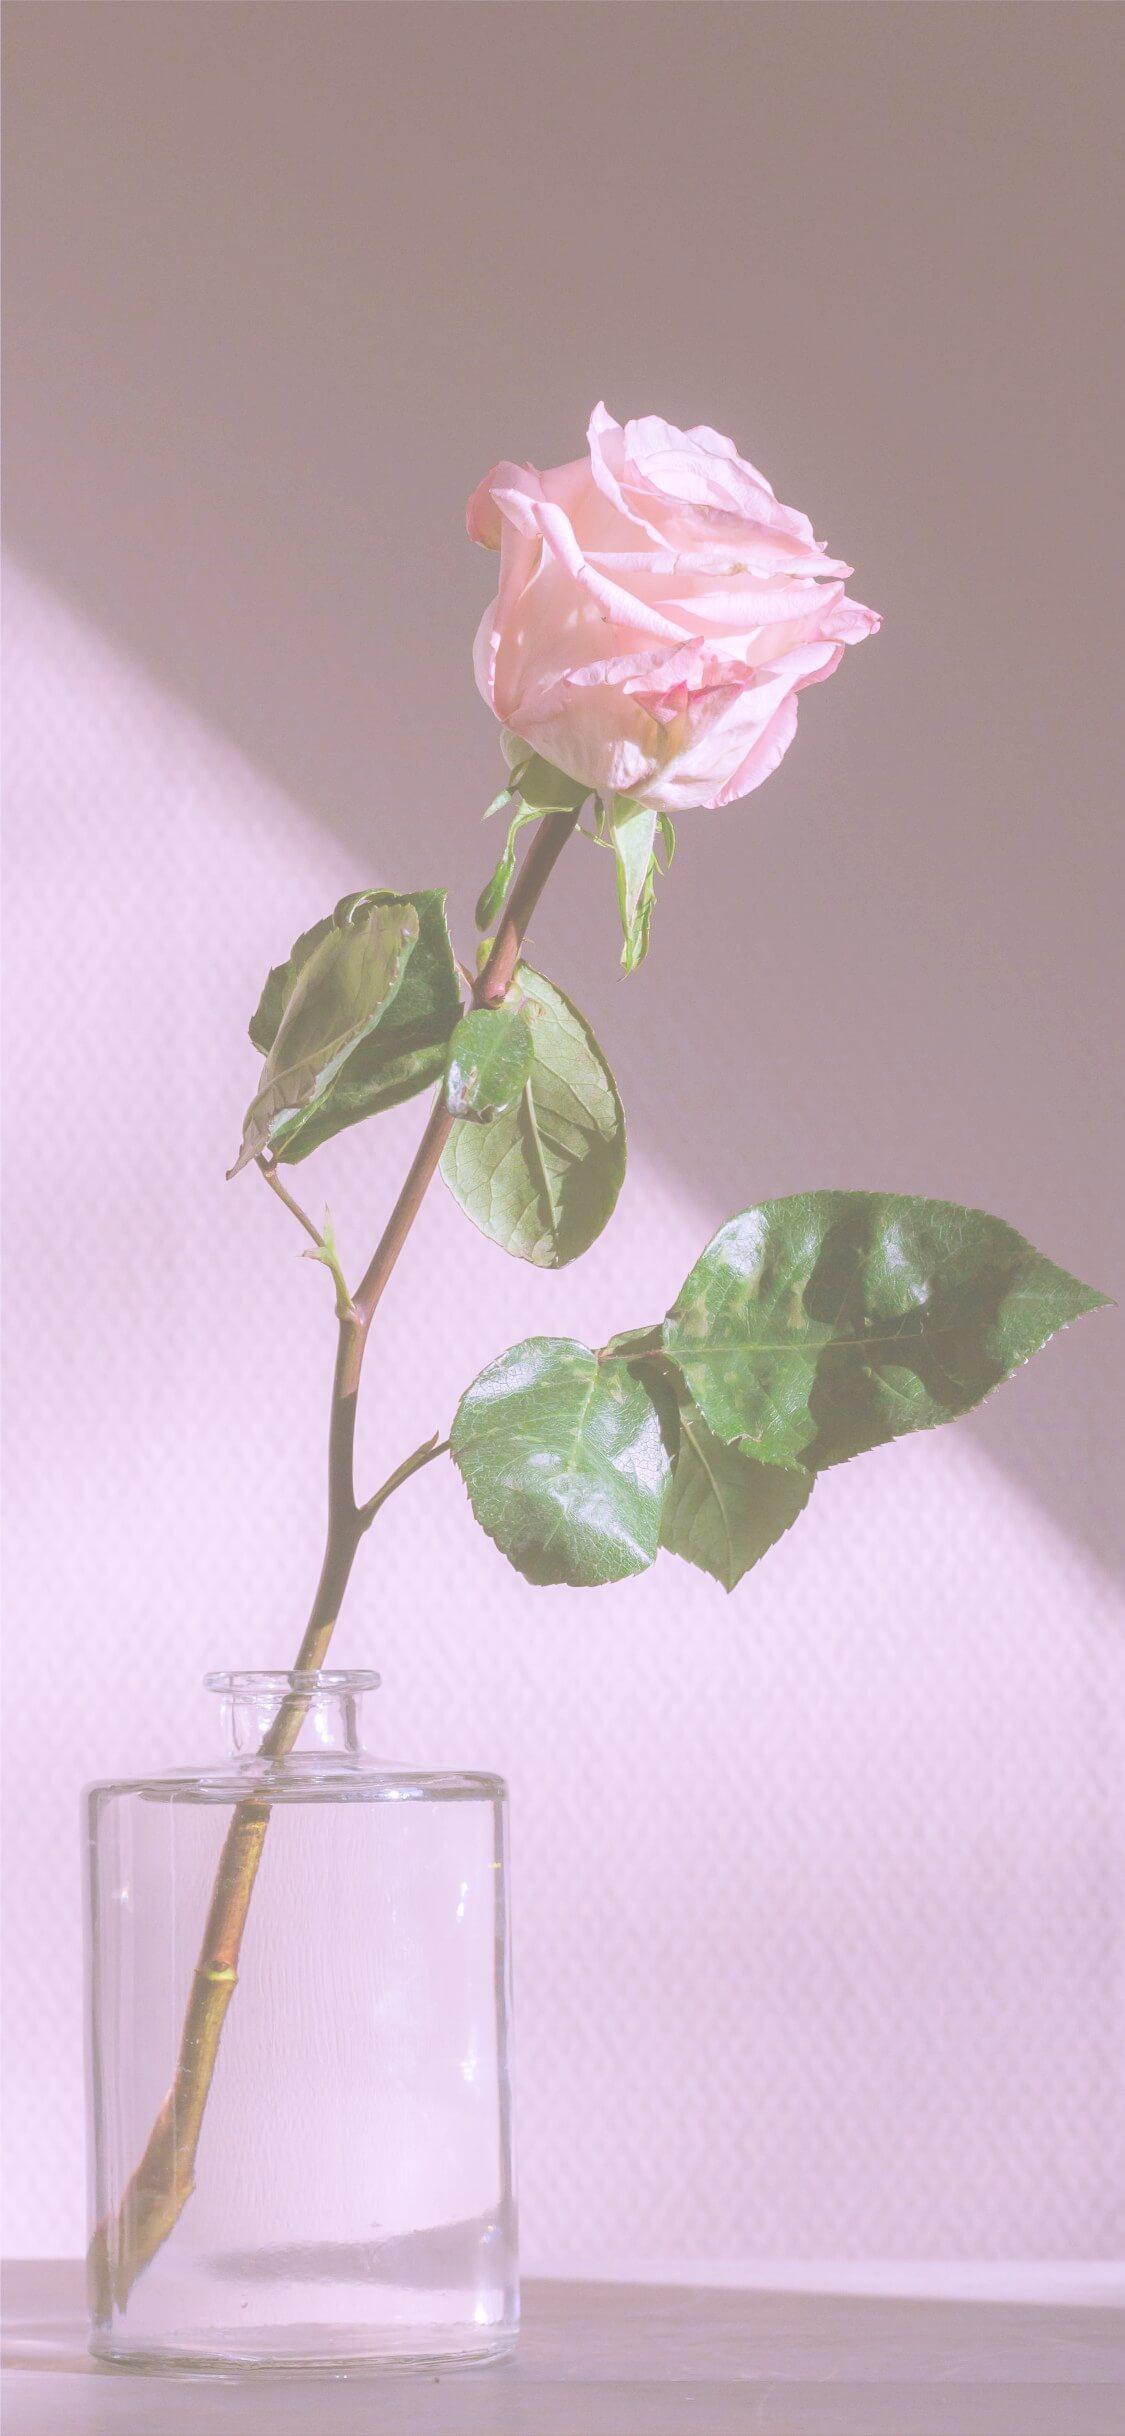 Iphone11pro Iphonexs Xロック画面等シンプルな花の無料壁紙配信中 ページ2